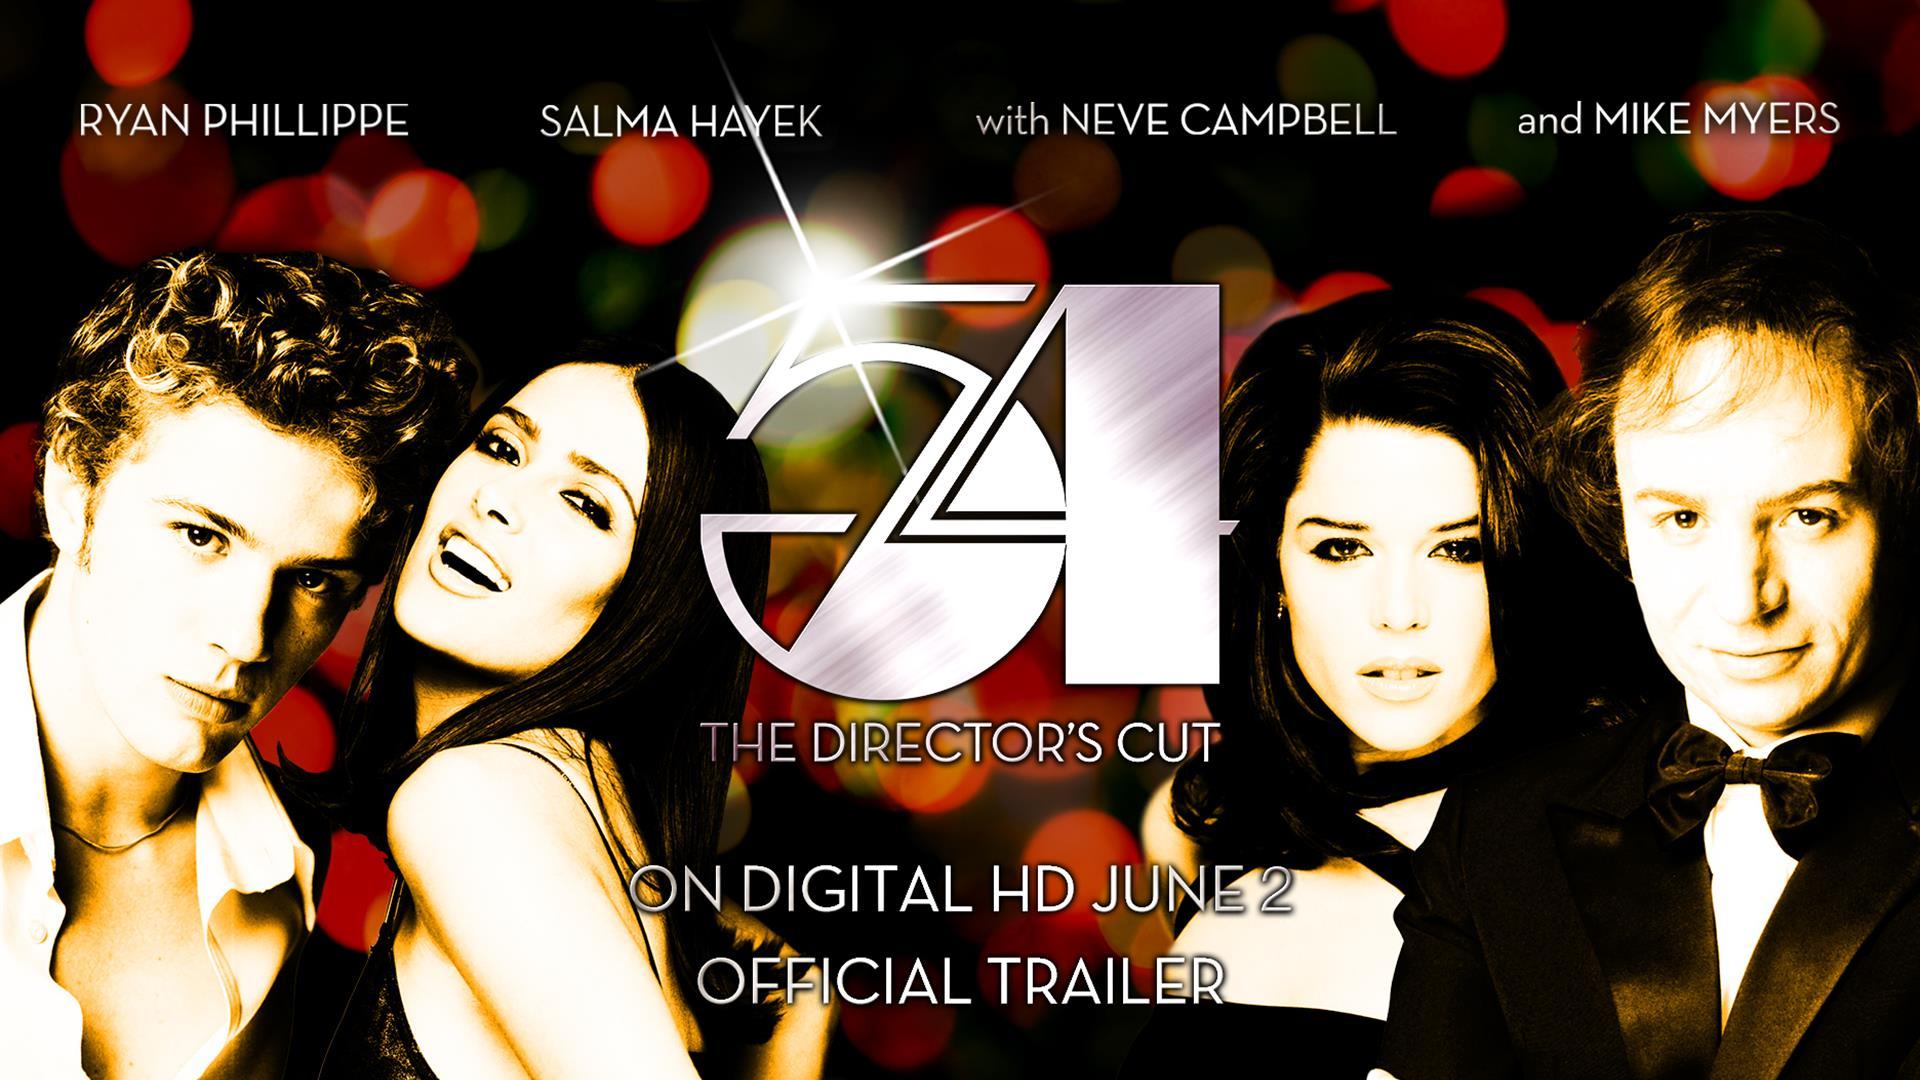 54: The Directors Cut - Official Trailer (HD)